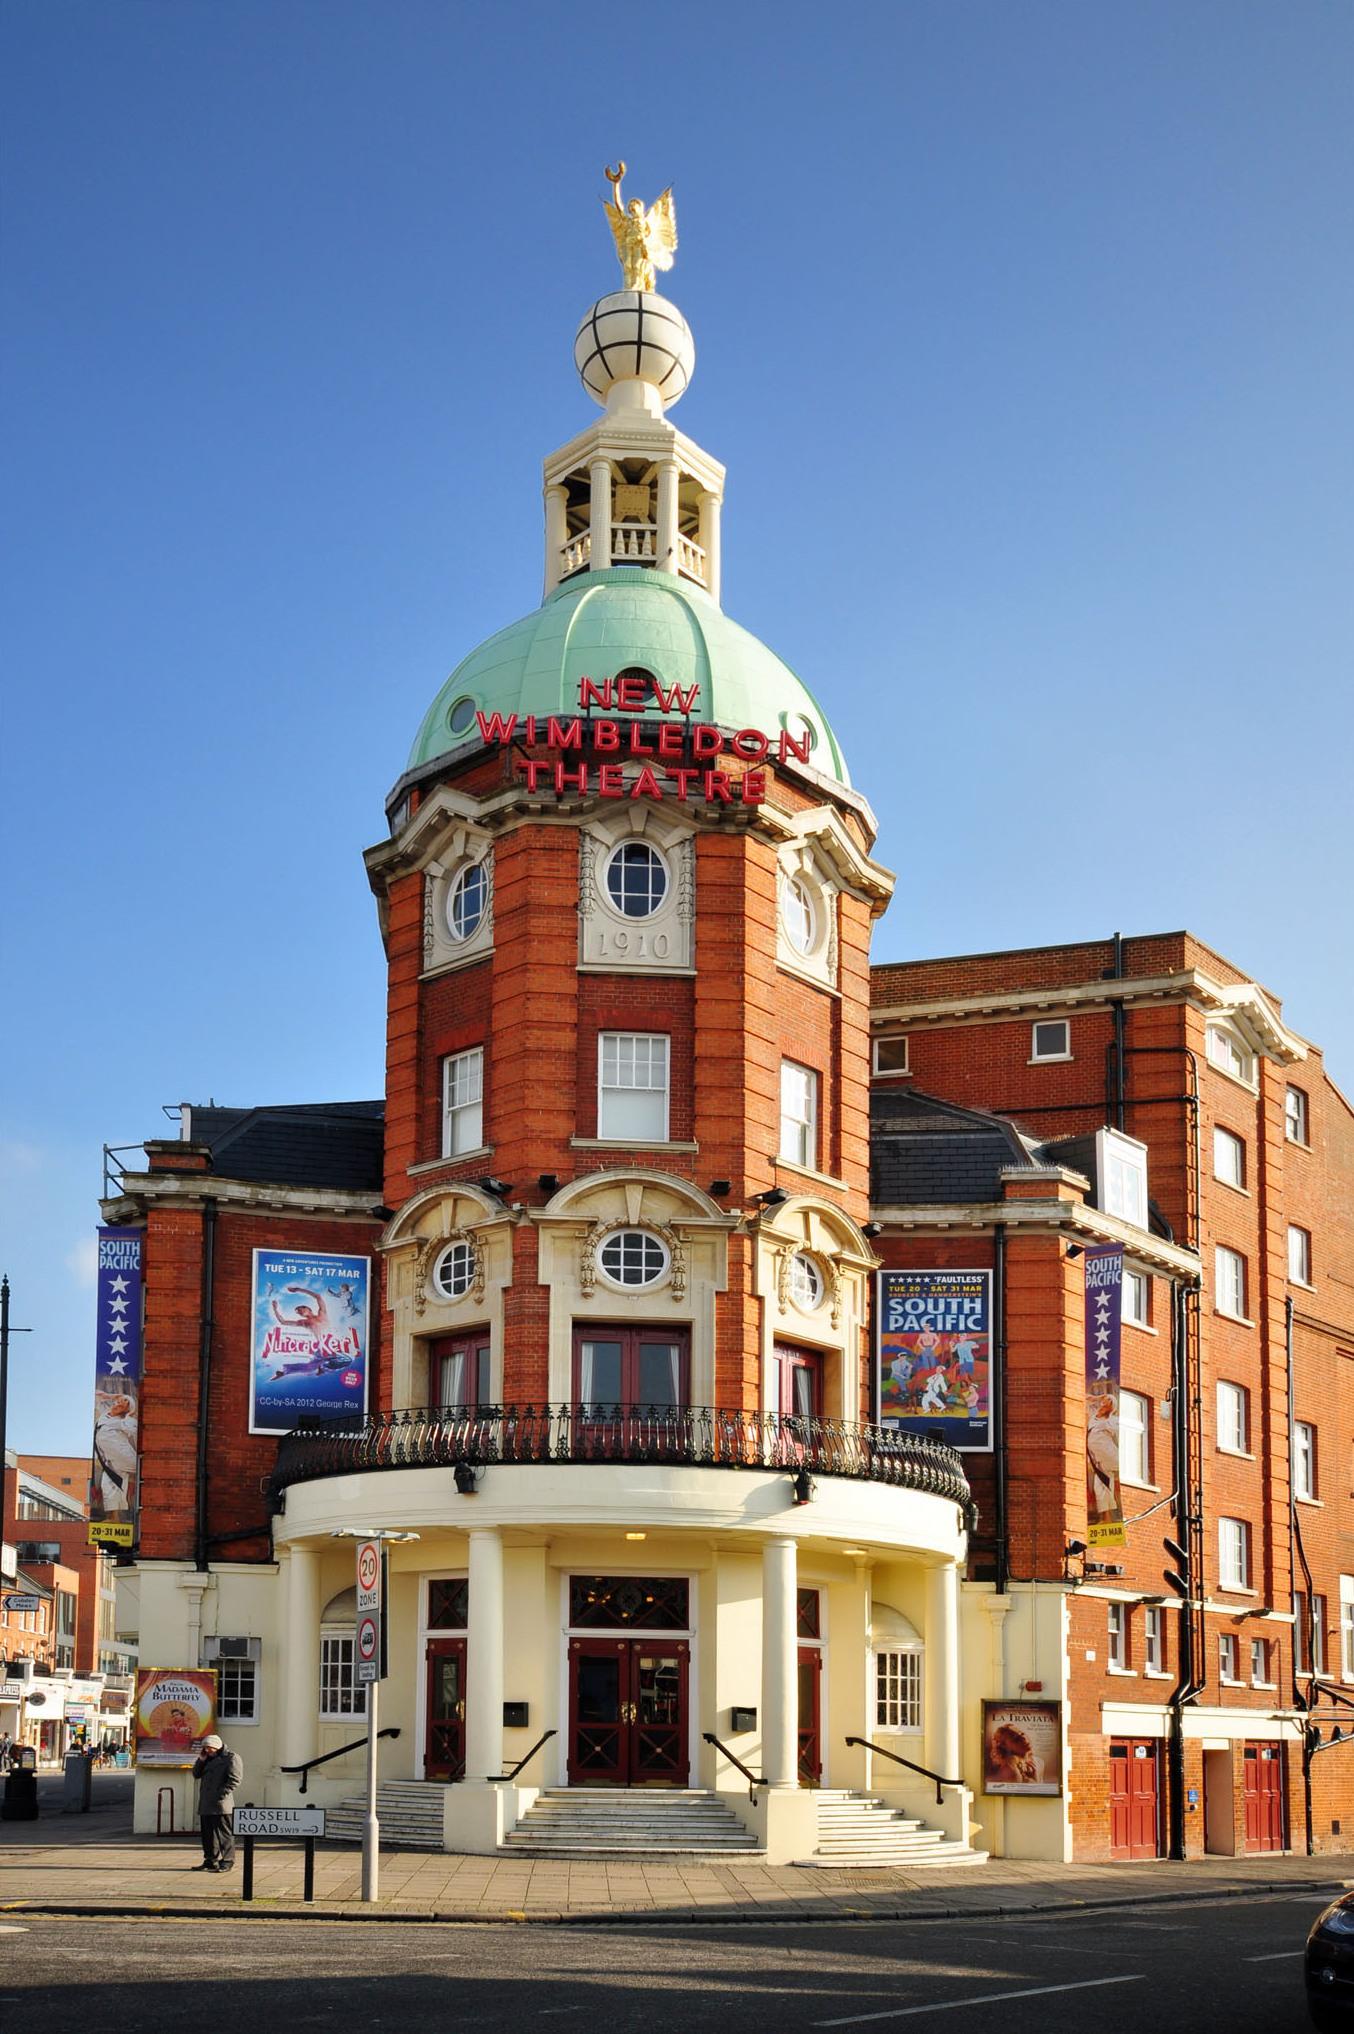 New Wimbledon Theatre Wikipedia